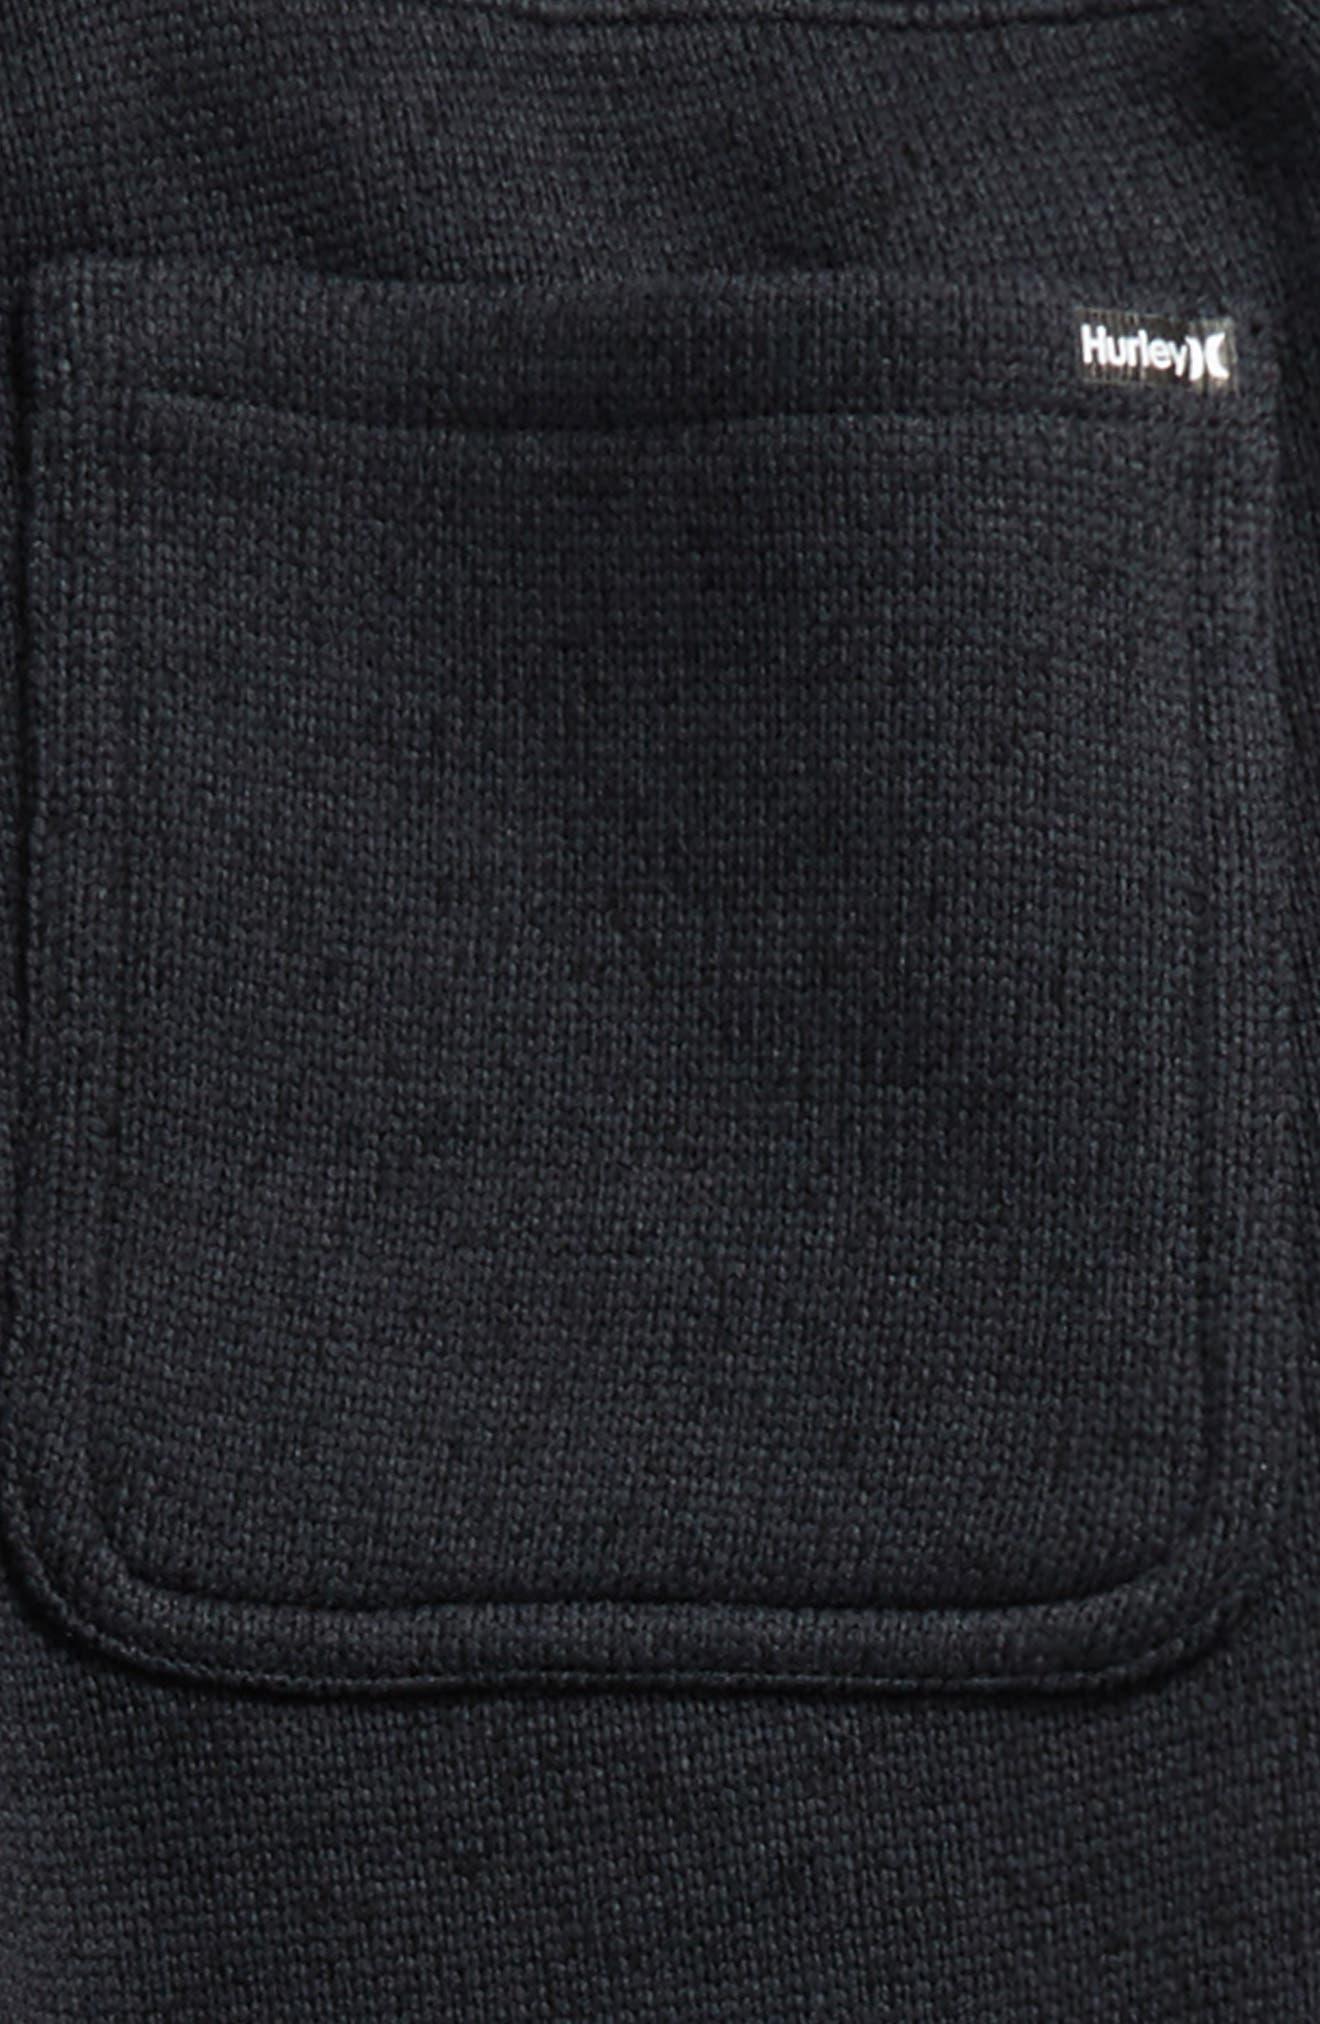 Sweater Knit Fleece Pants,                             Alternate thumbnail 5, color,